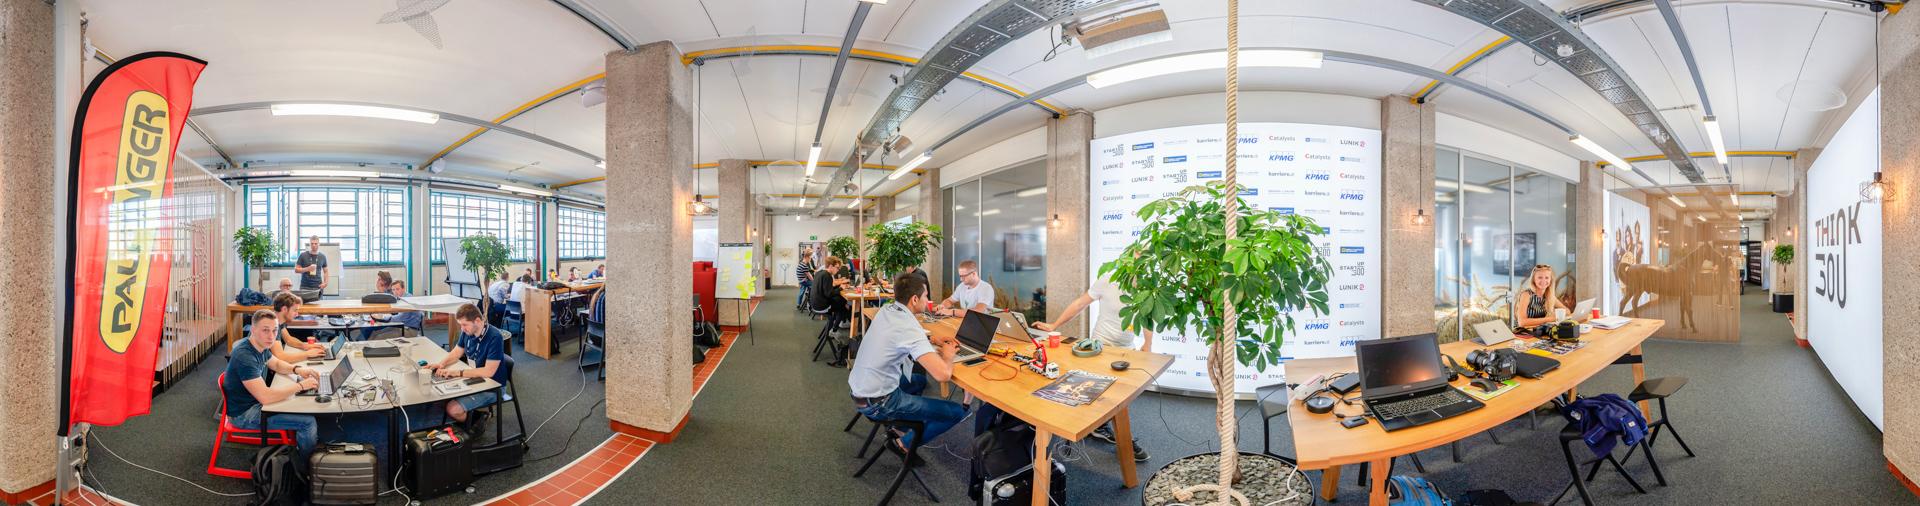 industry 4.0 hackathon